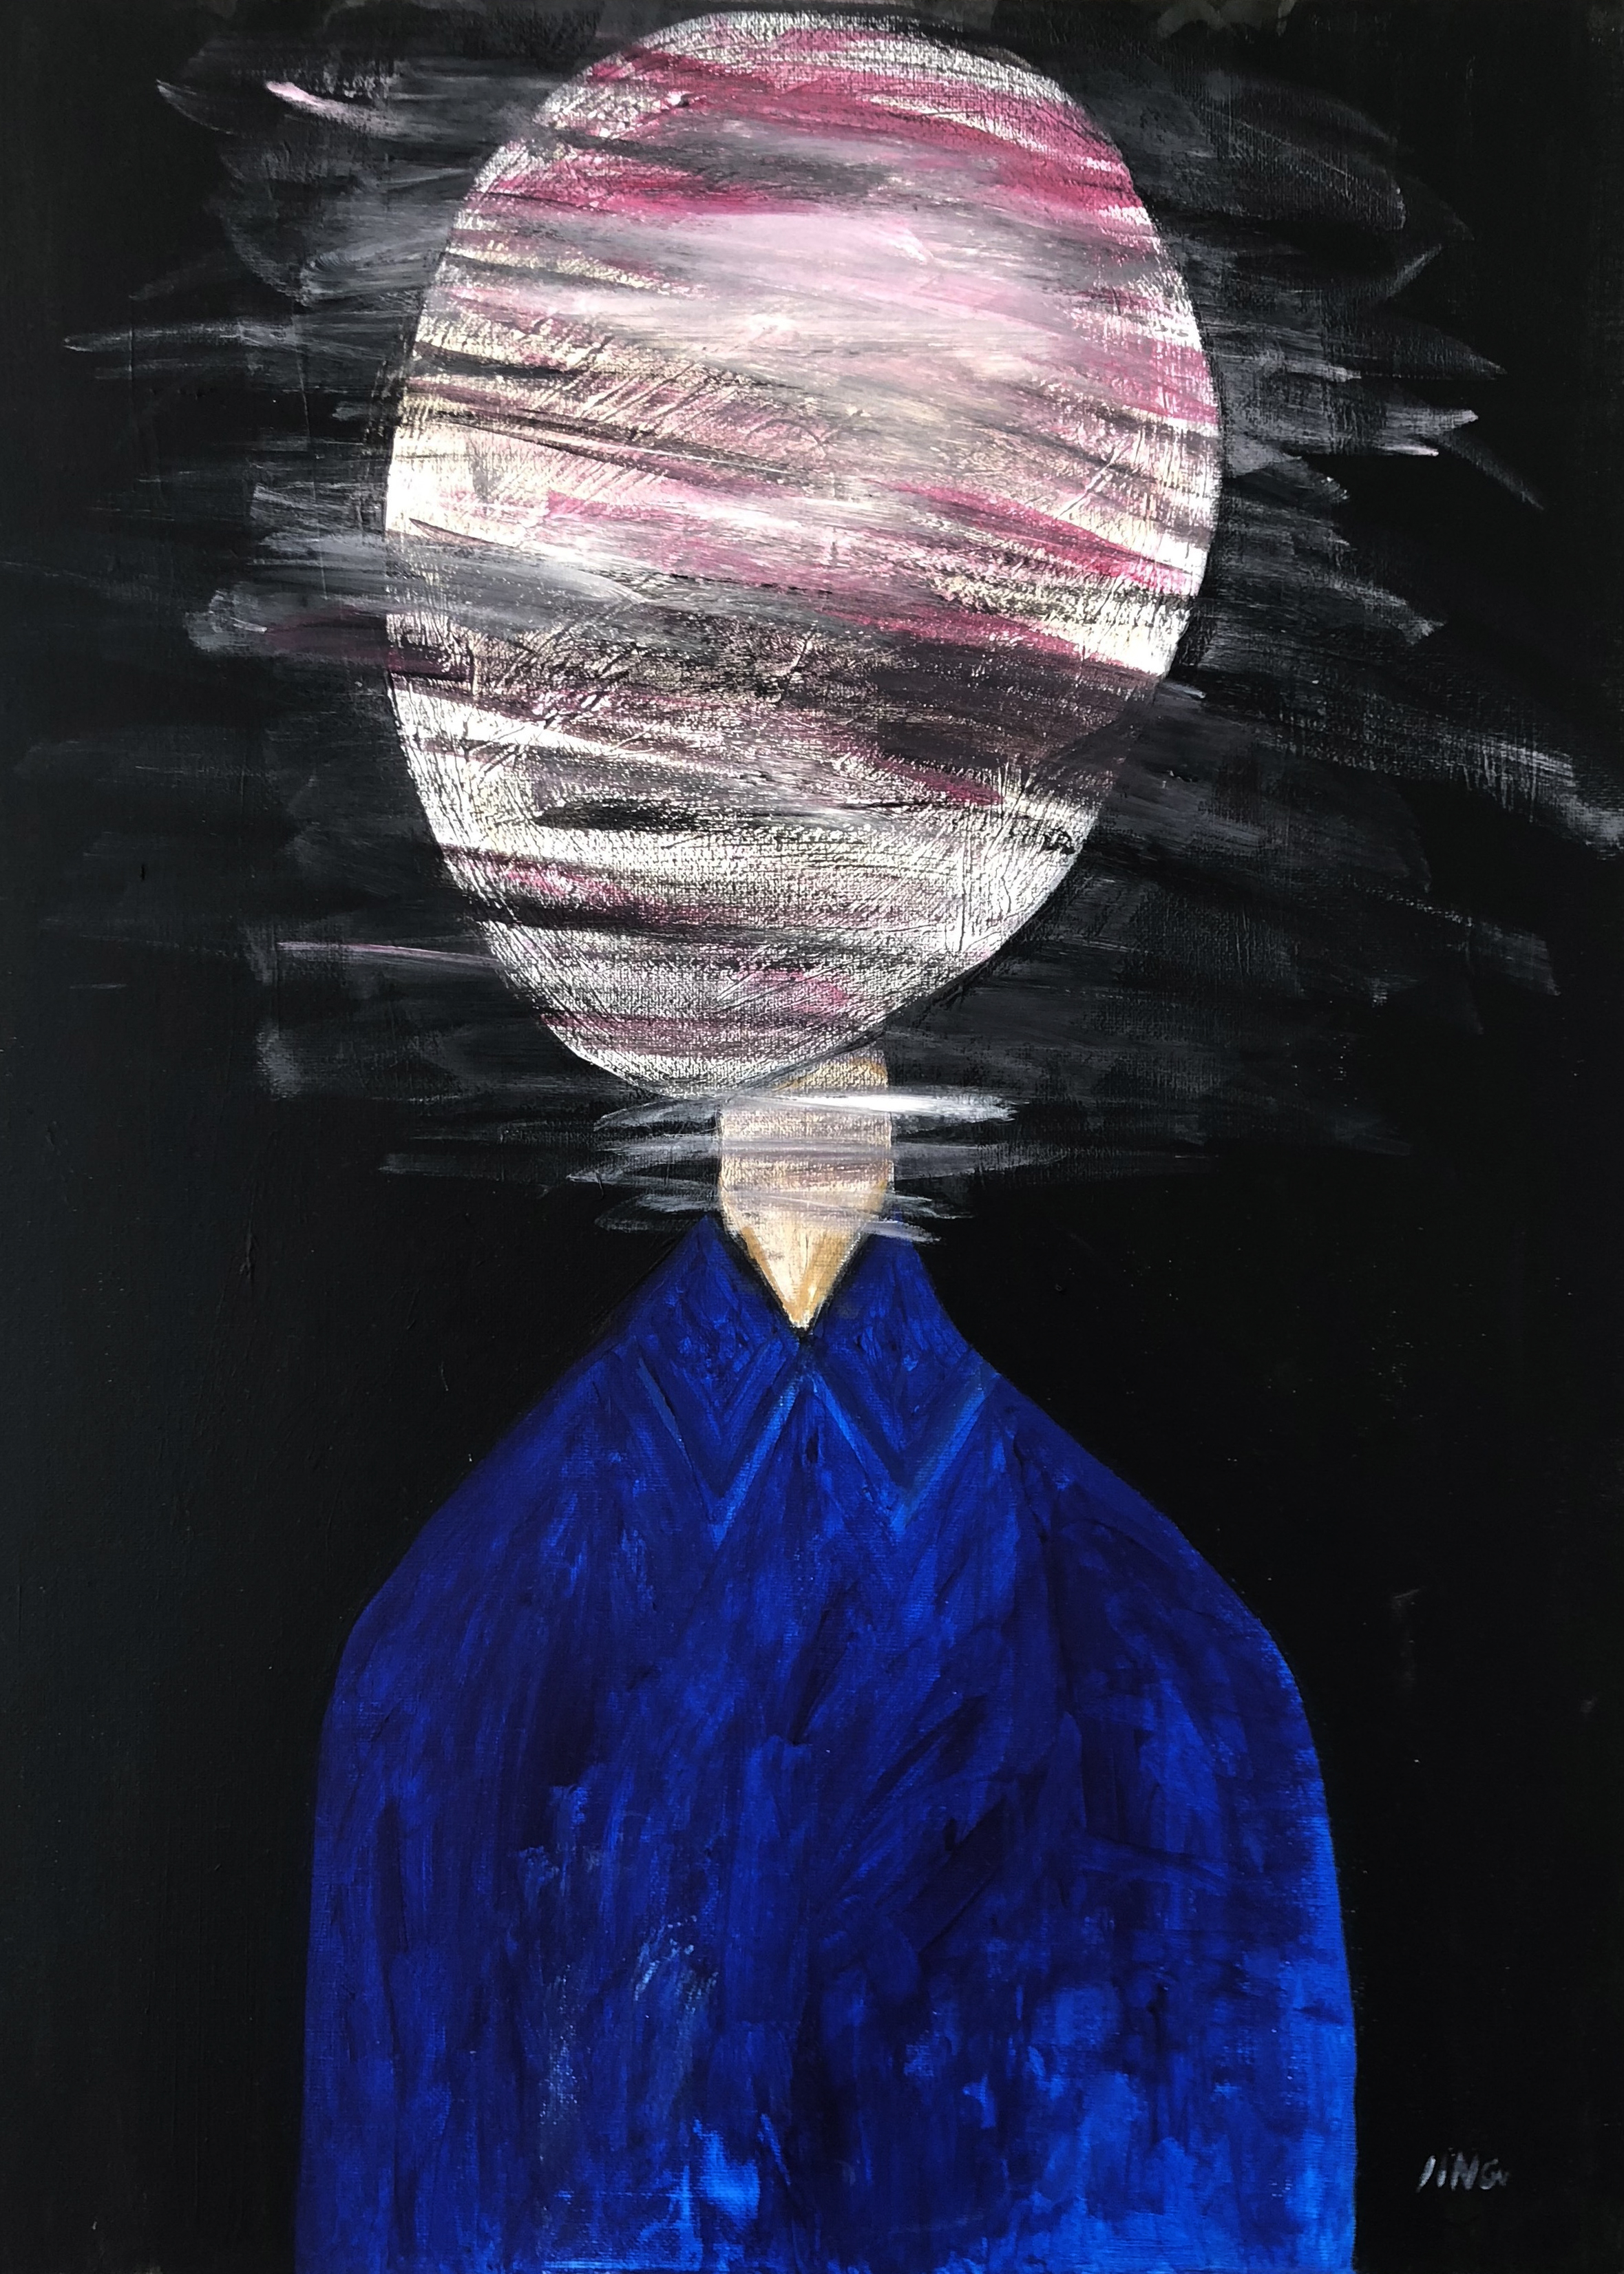 daydreaming  acrylic on canvas  45 x 65 cm